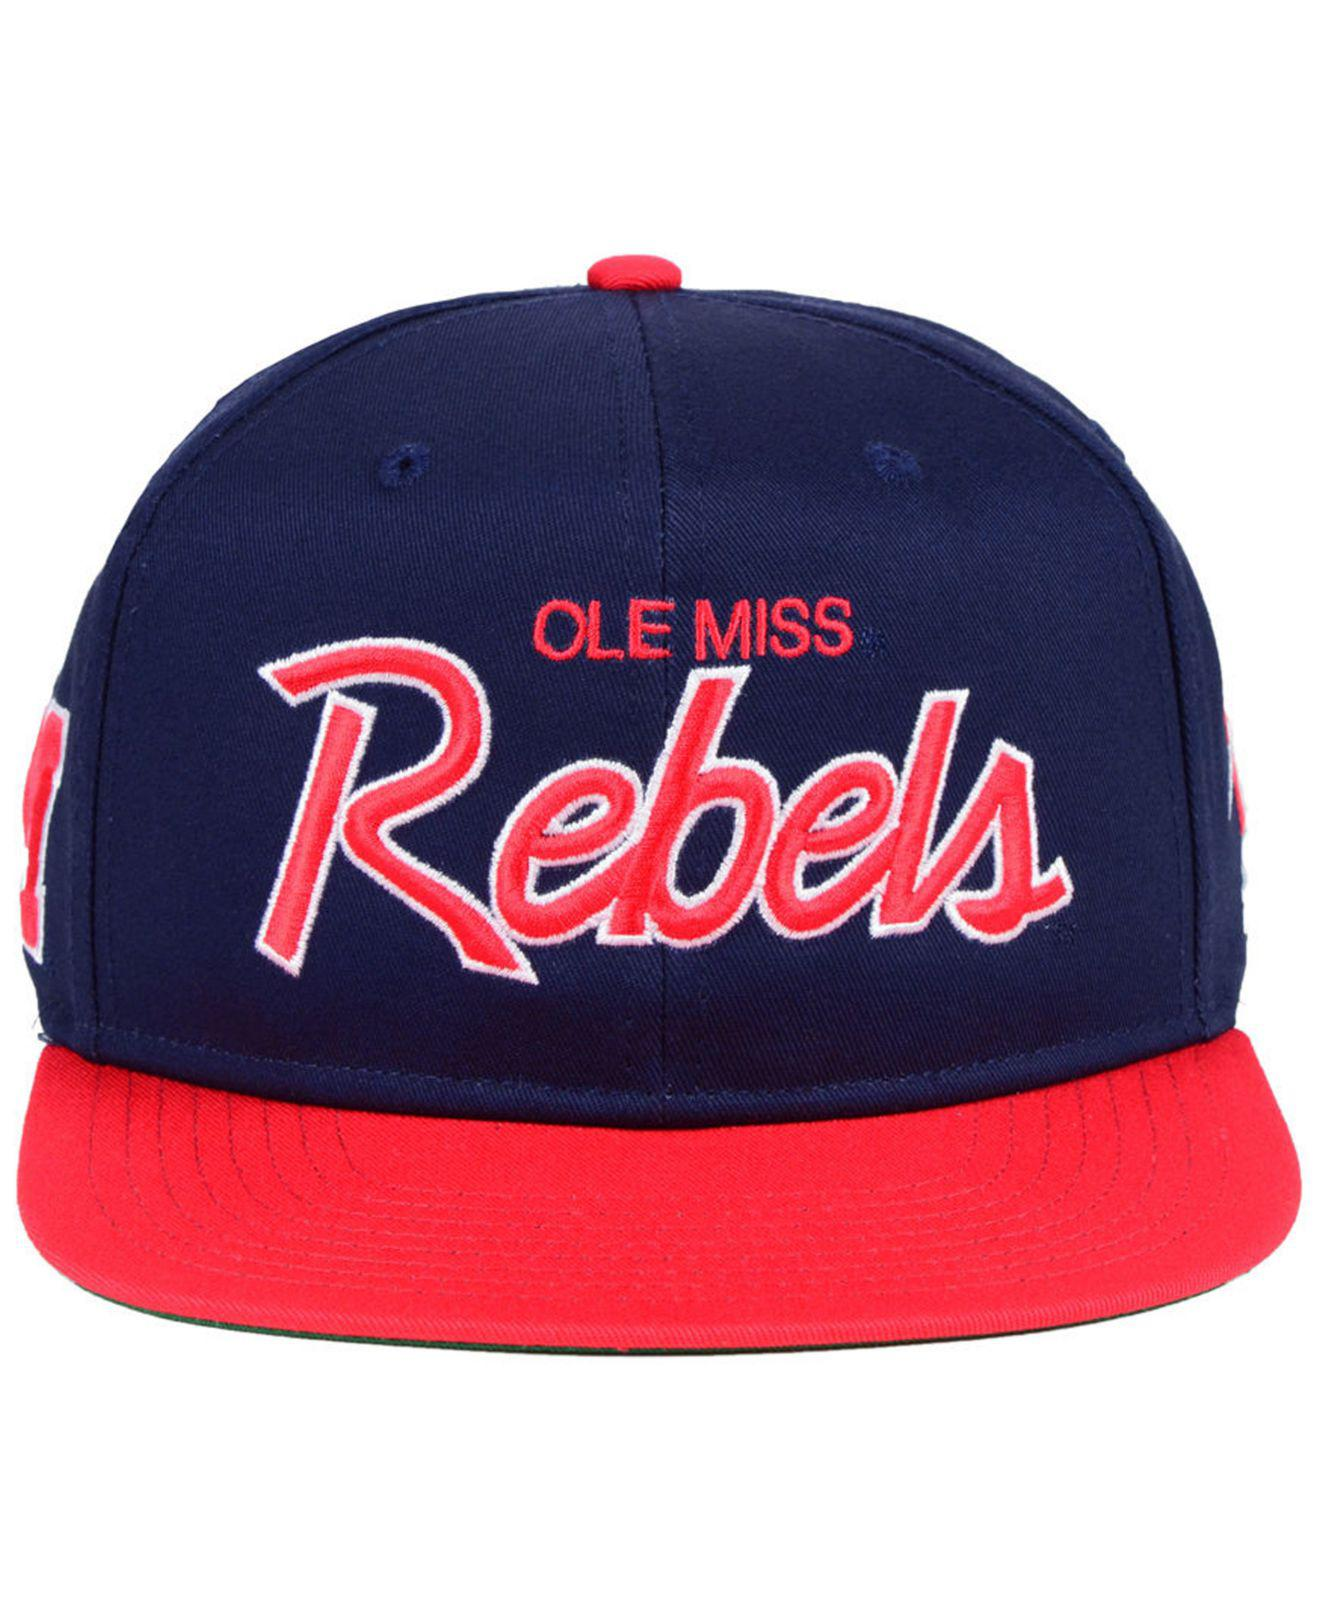 67ec2f155e1f7 1a7dc 9ebfb  get lyst nike ole miss rebels sport specialties snapback cap  in blue for men 20206 eac82